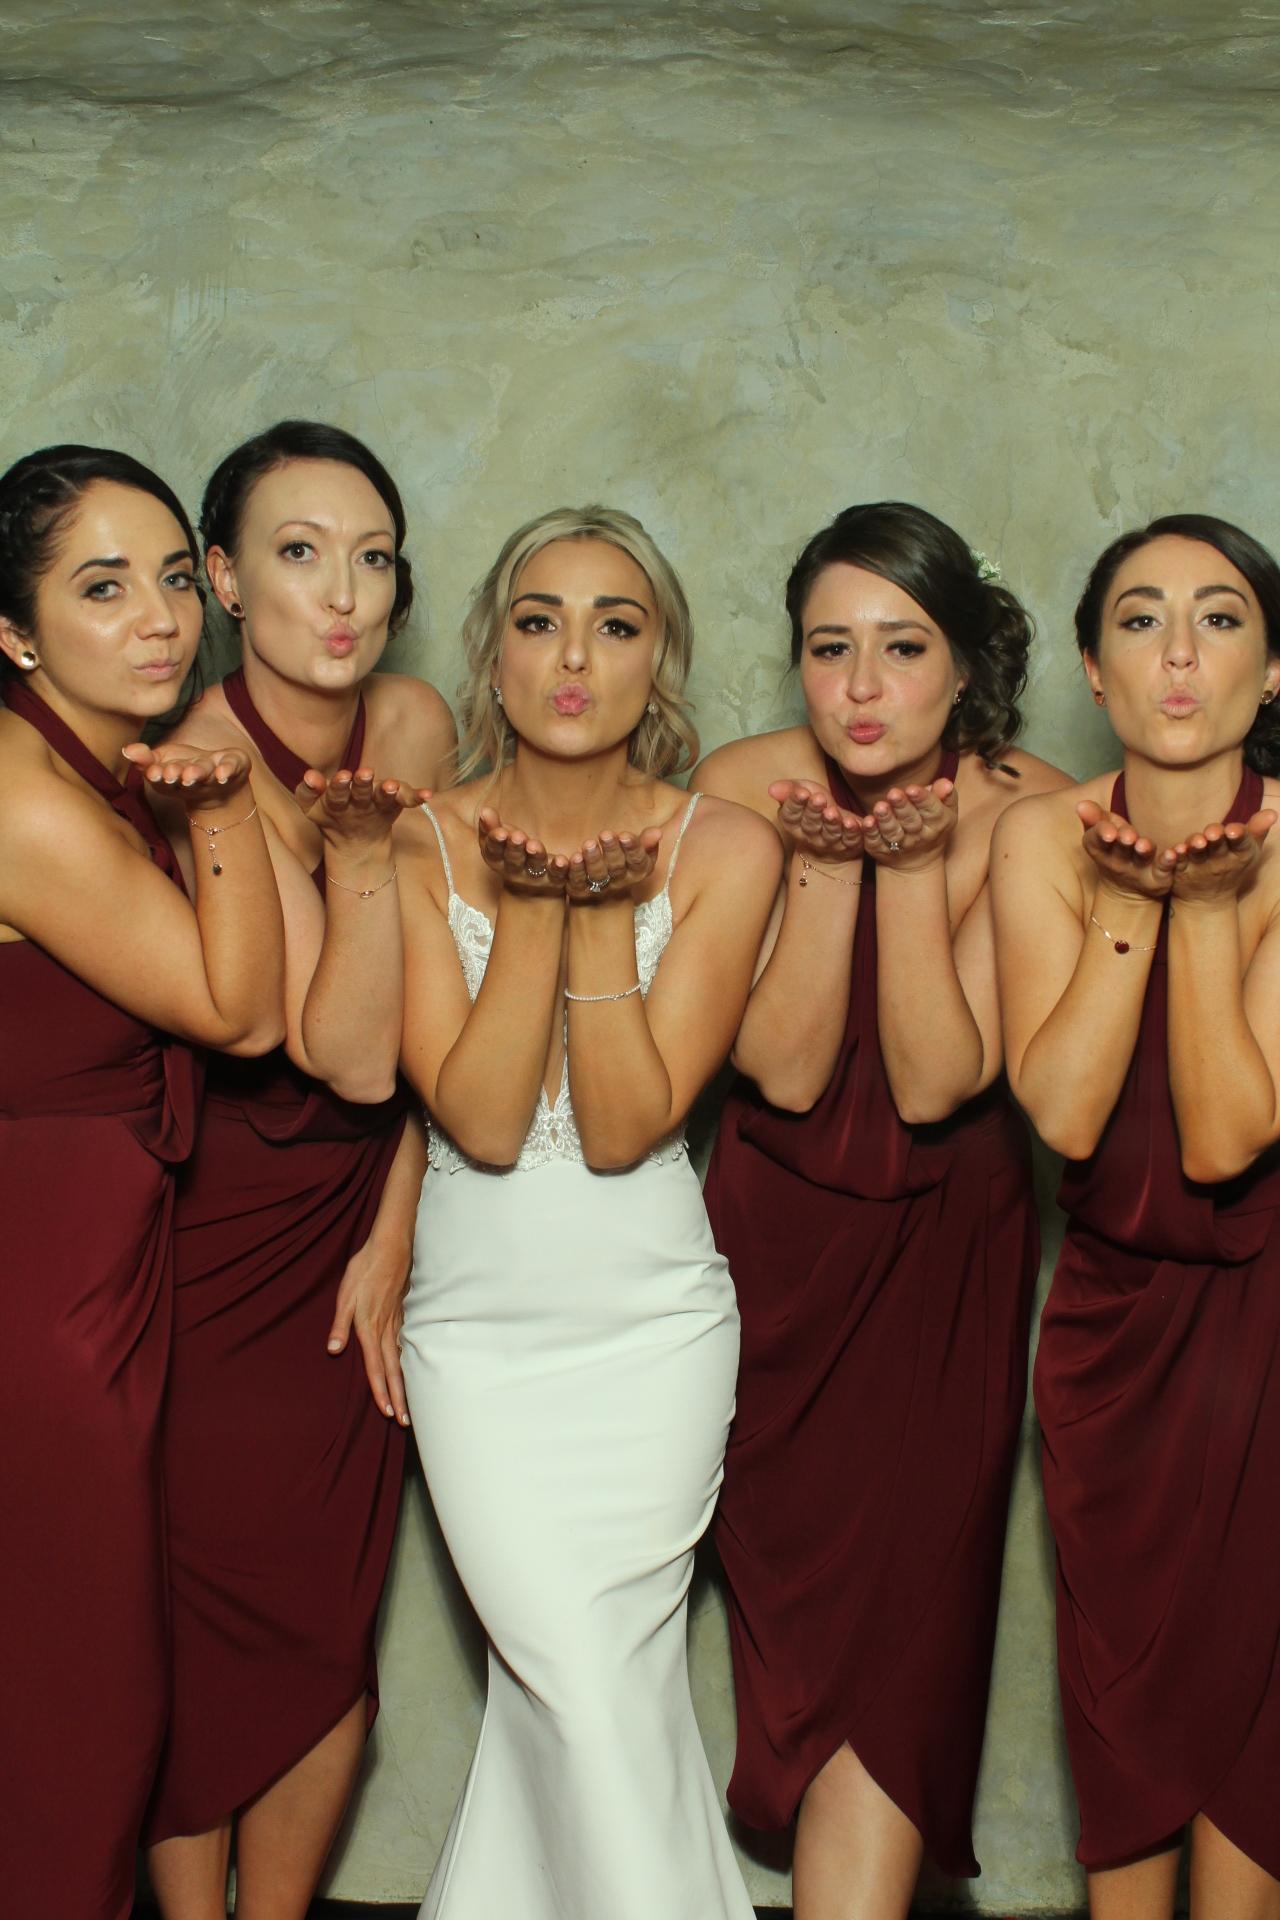 QTBooth_Queenstown_Photobooth_Wedding_Event_11.jpg